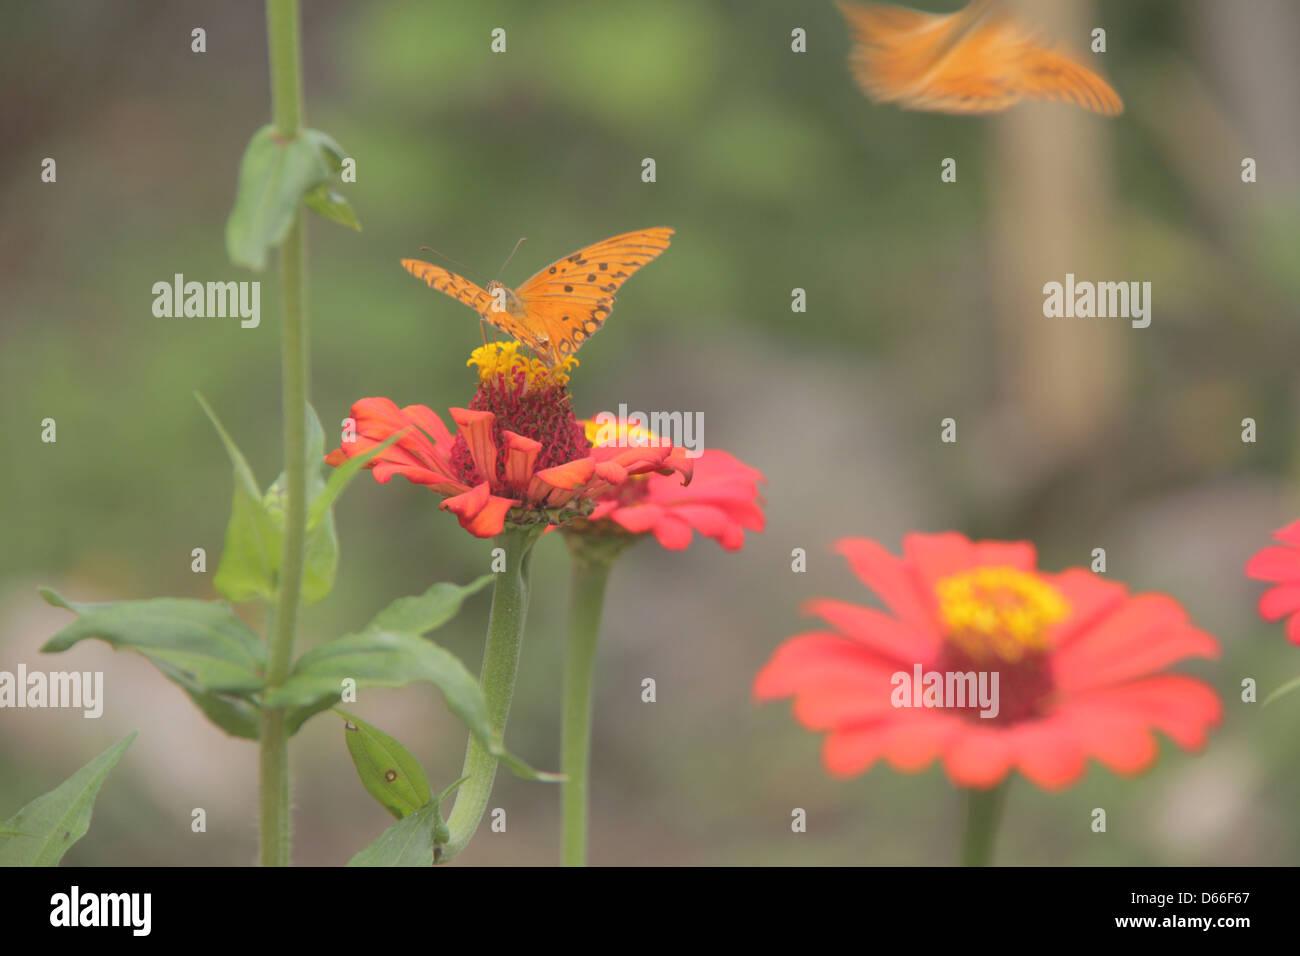 Butterfly on a flower of the cerrado goias chapada dos veadeiros - Stock Image